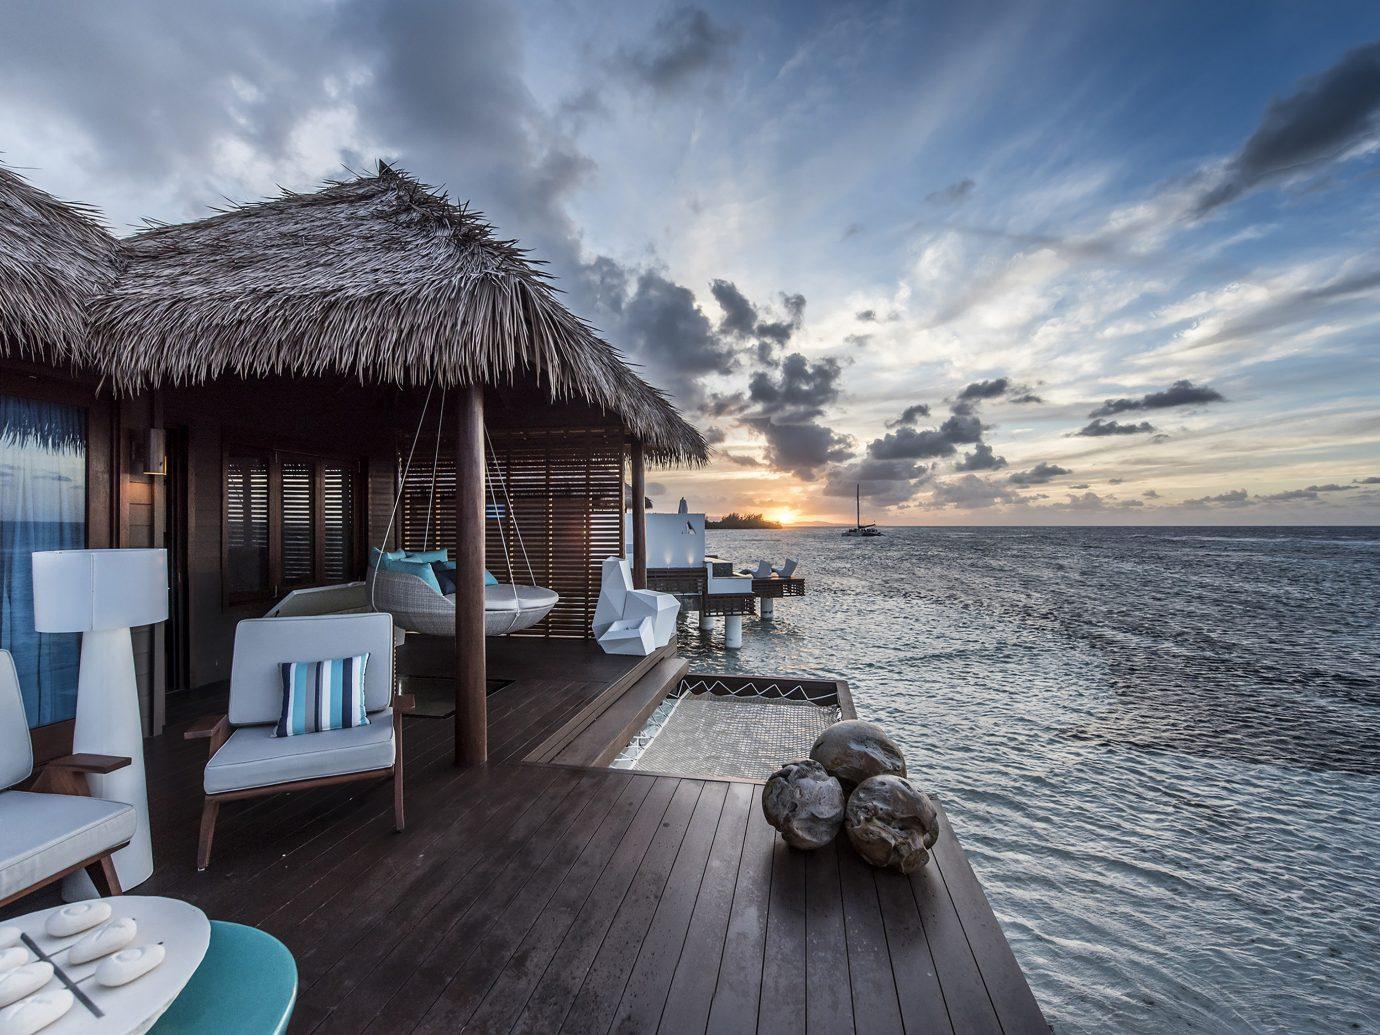 Hotels sky Sea vacation Ocean Beach vehicle Coast Resort bay furniture